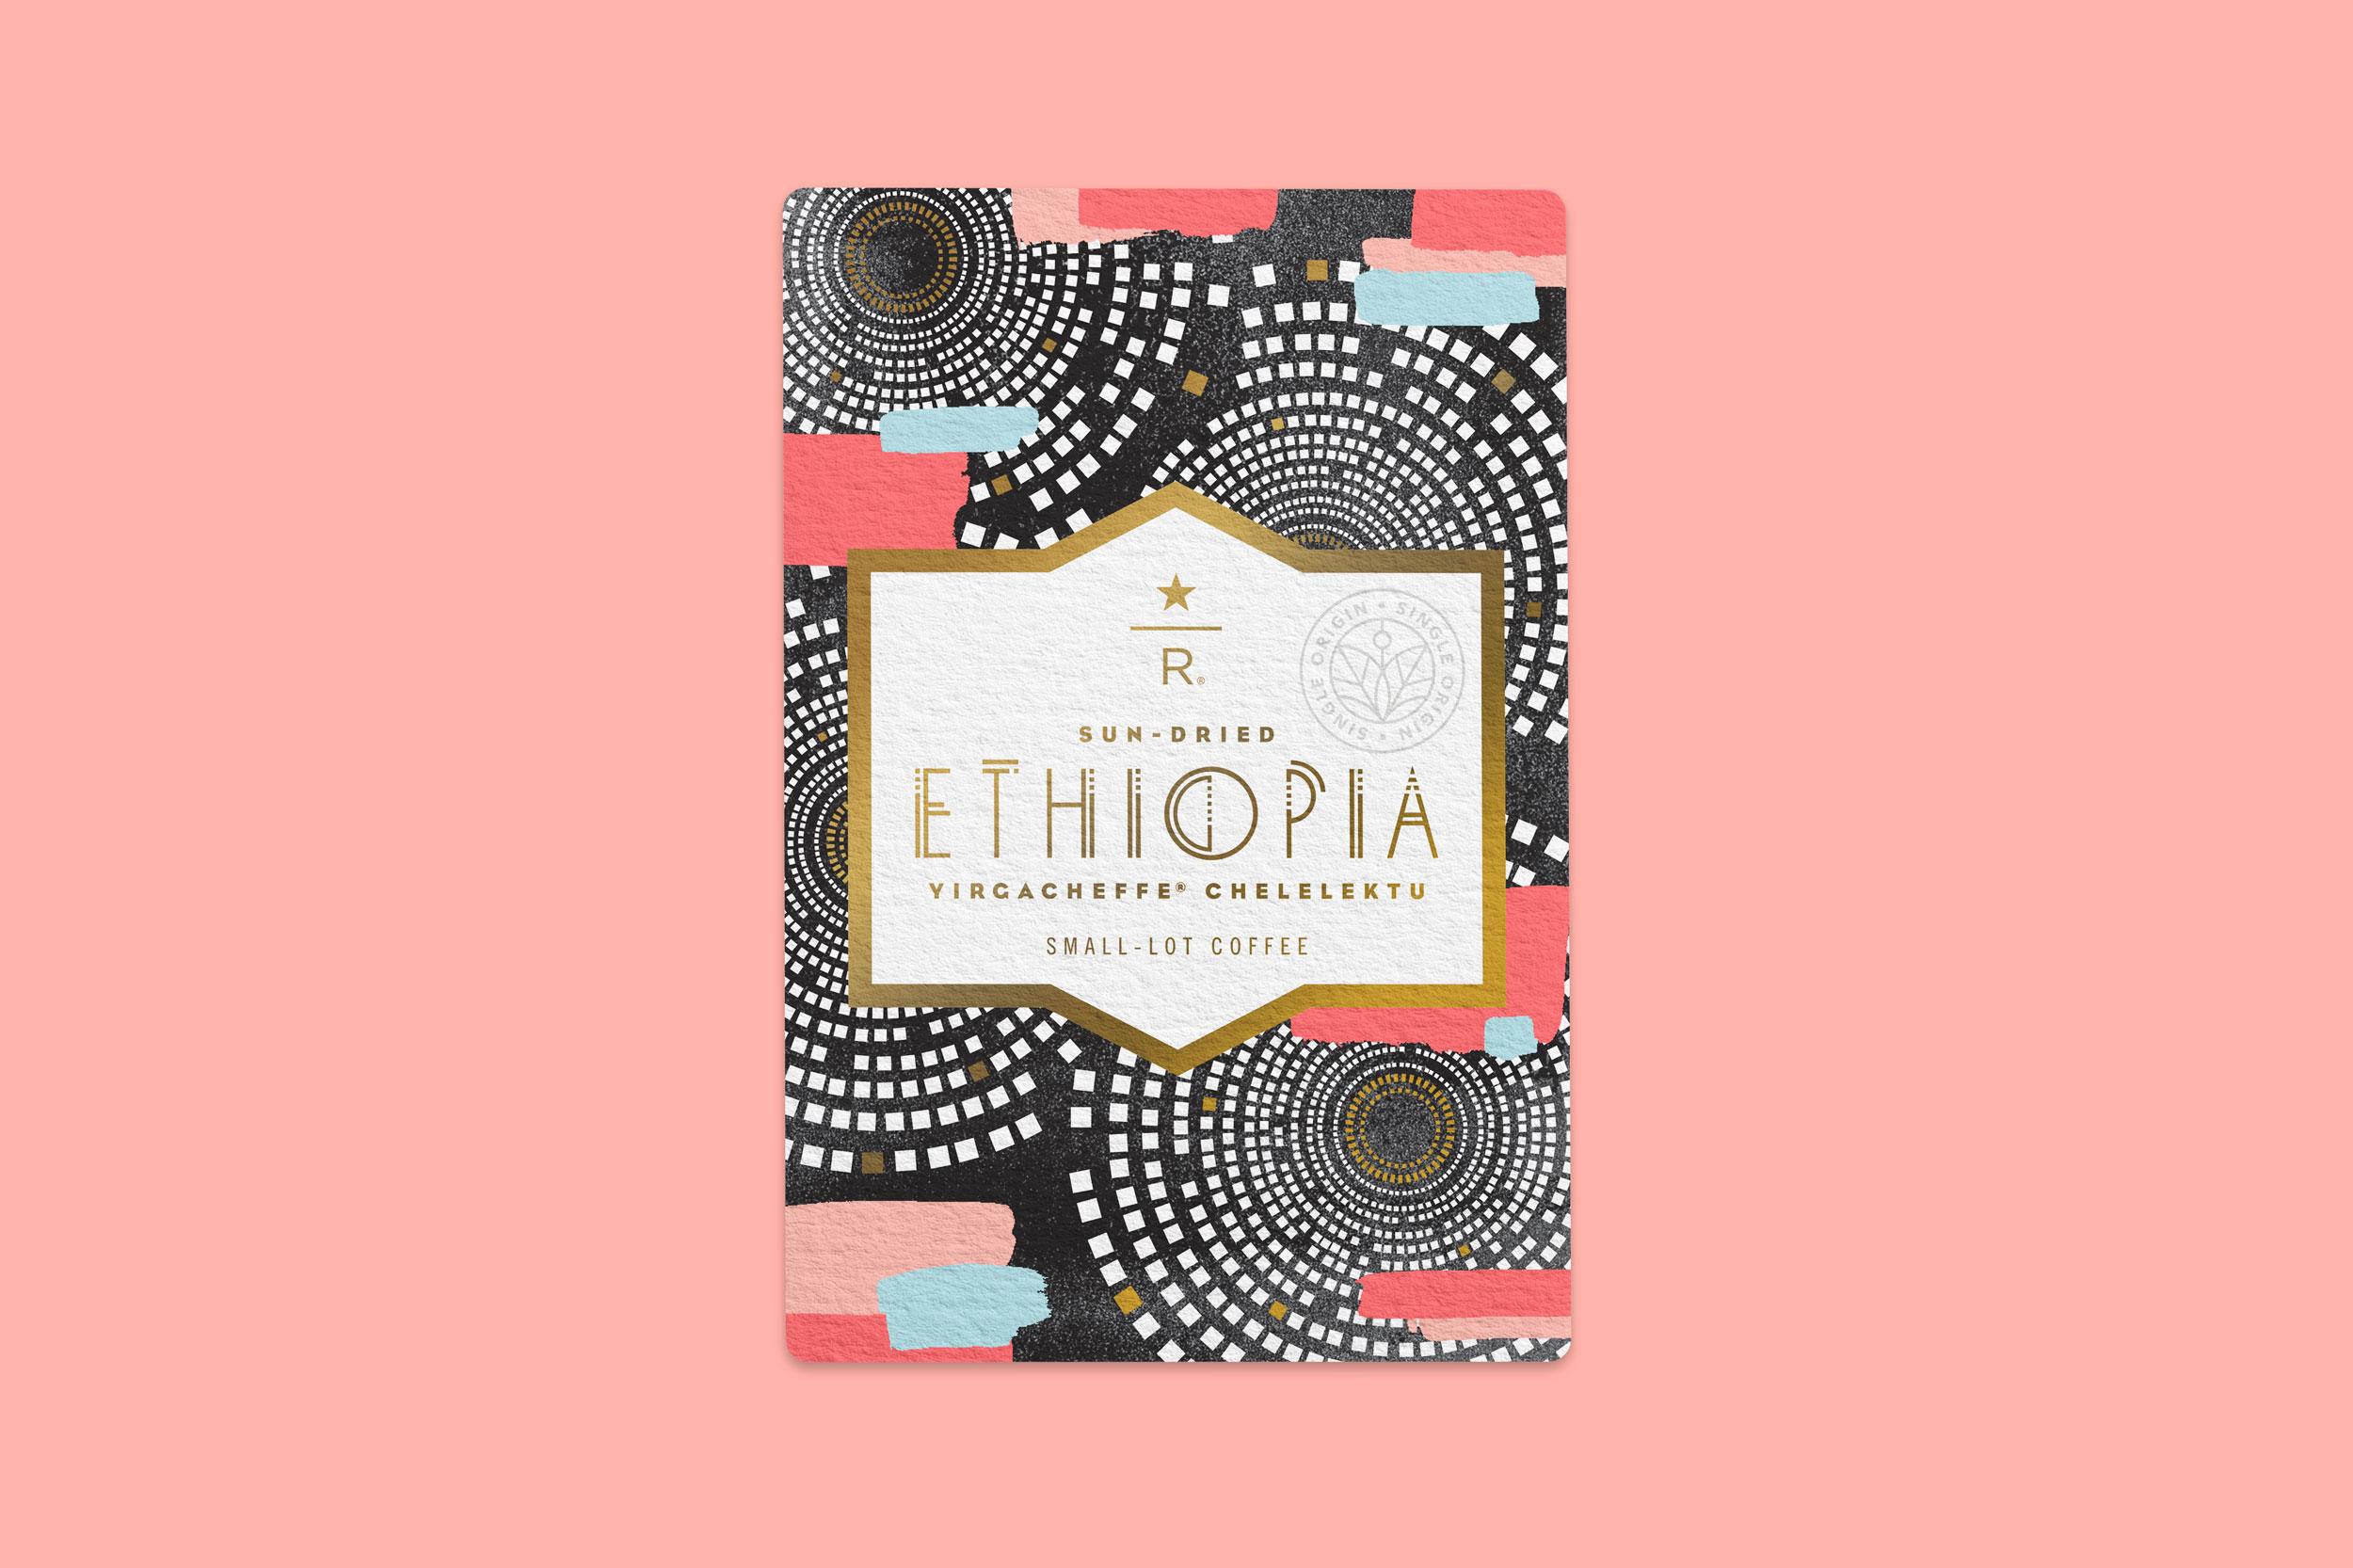 Ethiopia-Chelelektu-Reserve-Card-DETAIL-PAPER_TEX.jpg